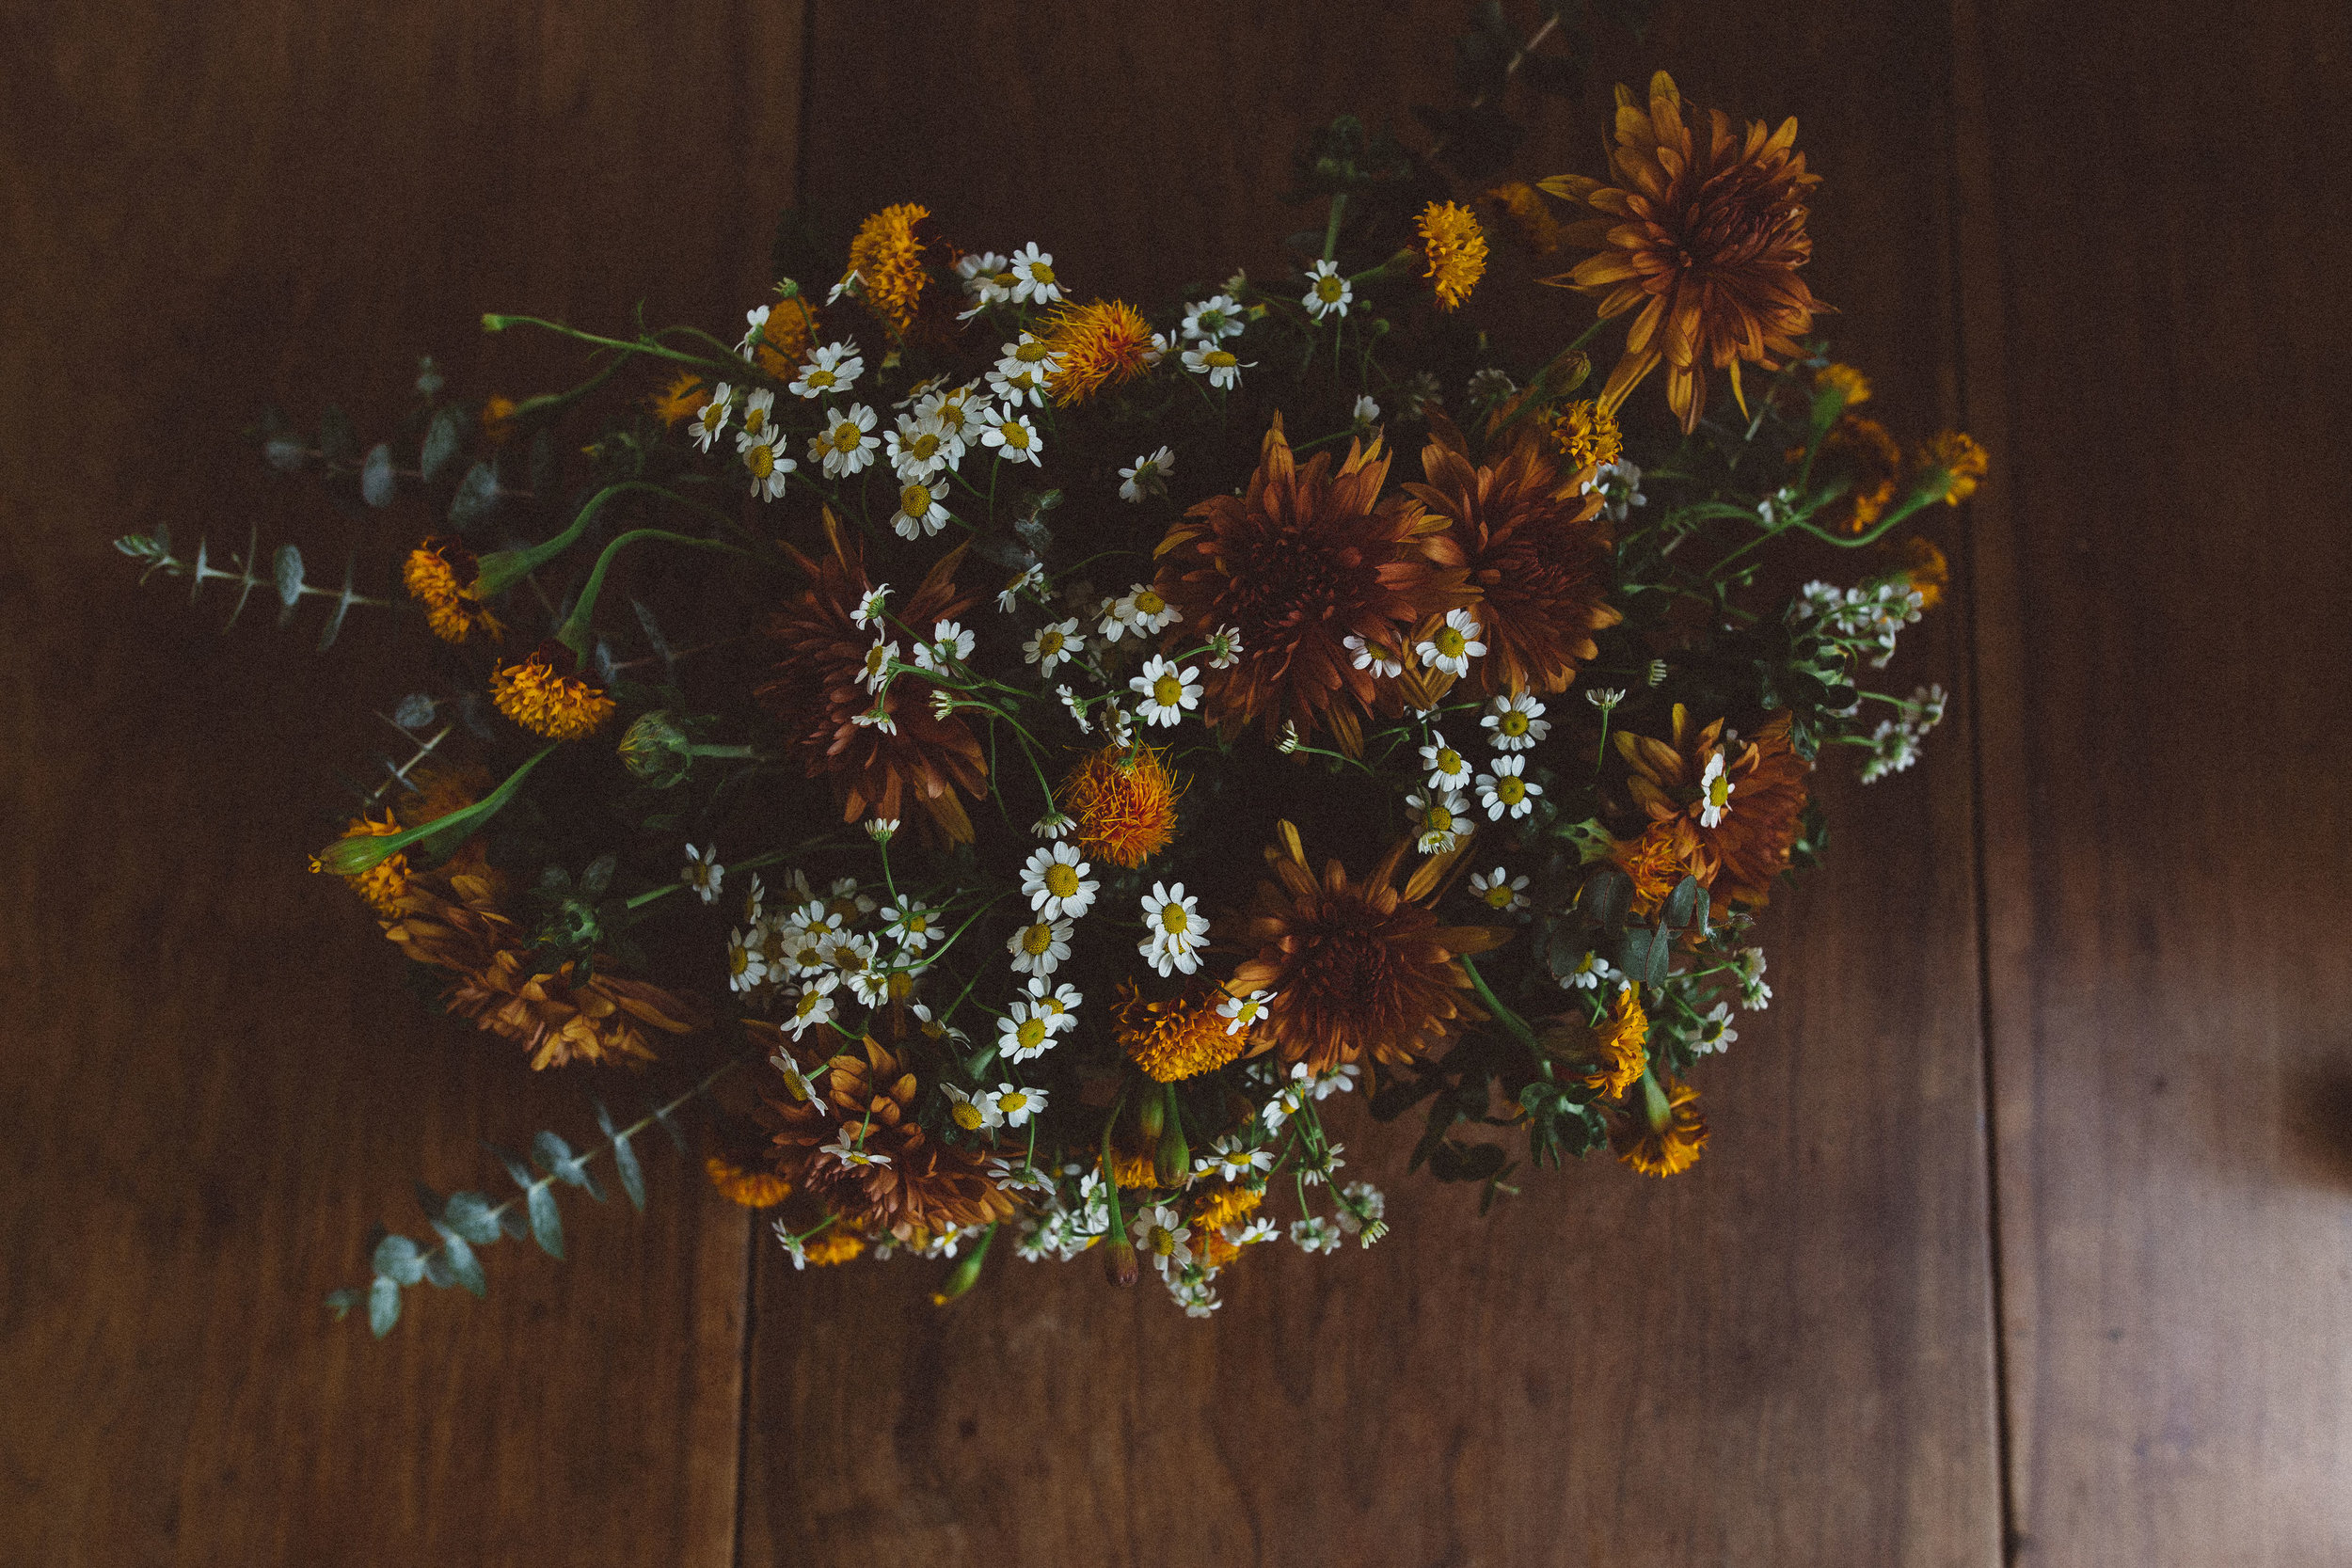 Your_Johnson_Flowers-8928.jpg